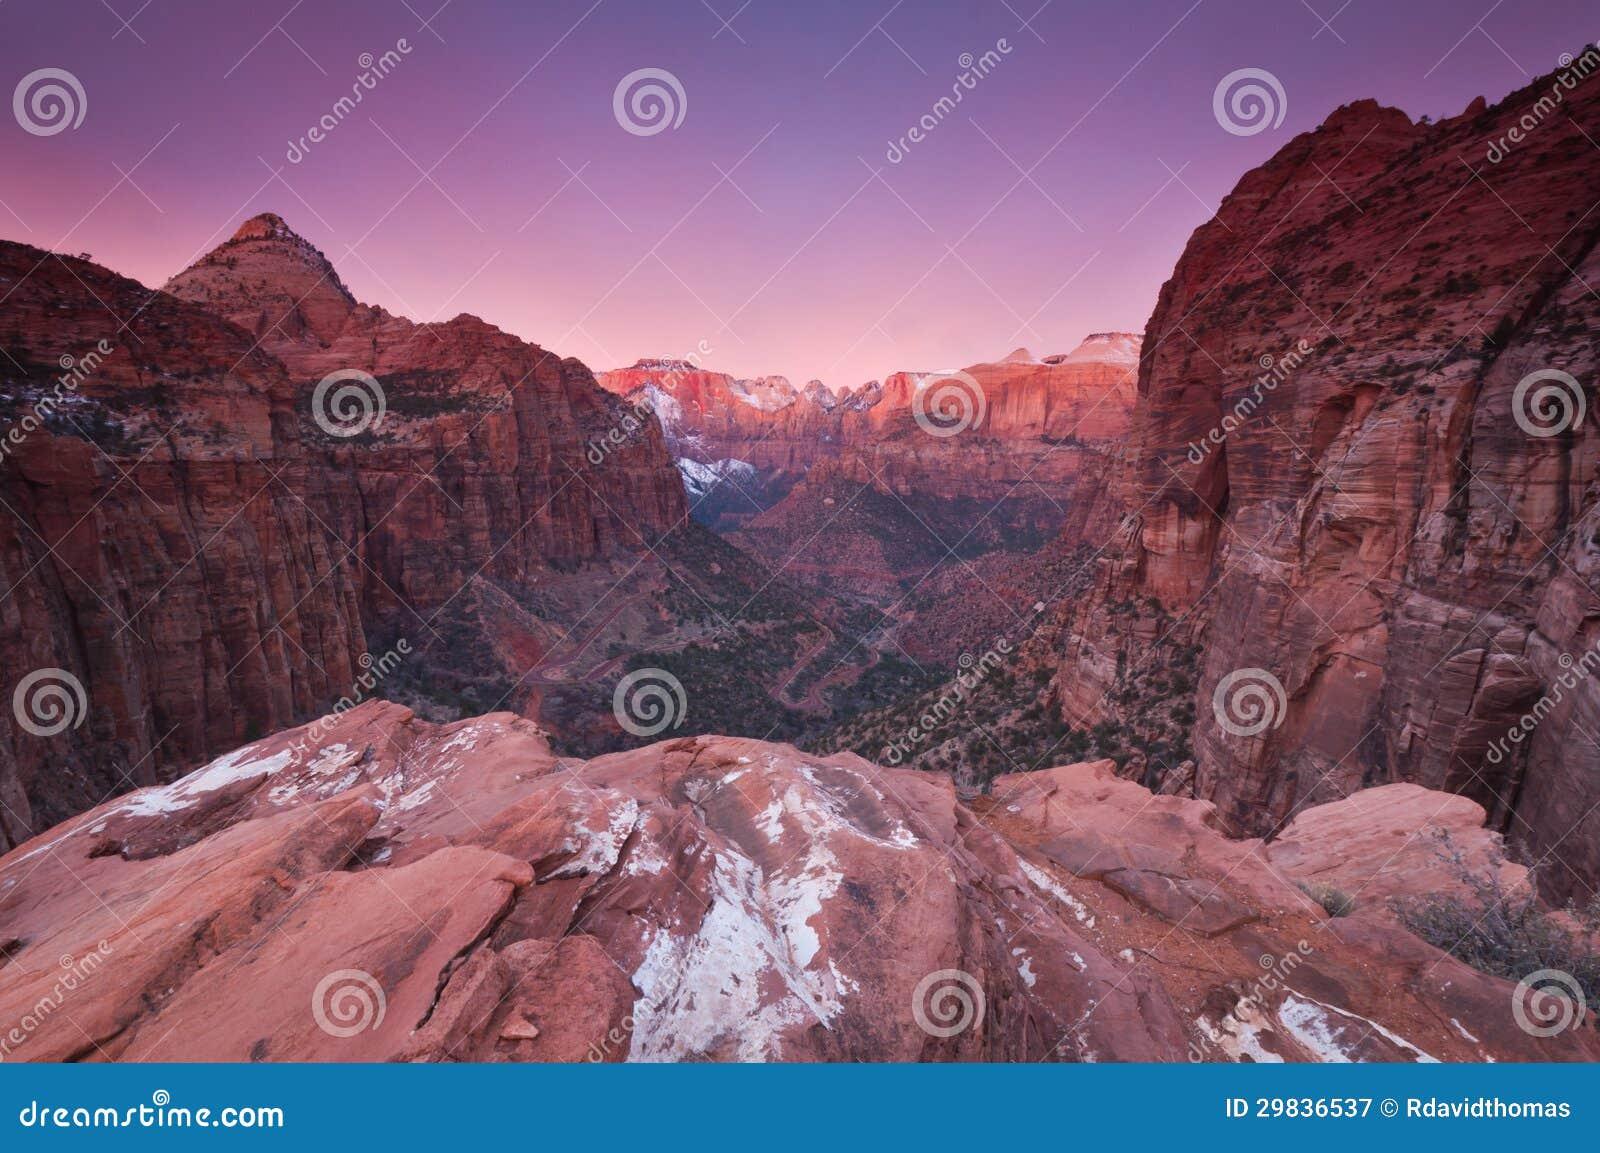 Sunrise over Zion National Park